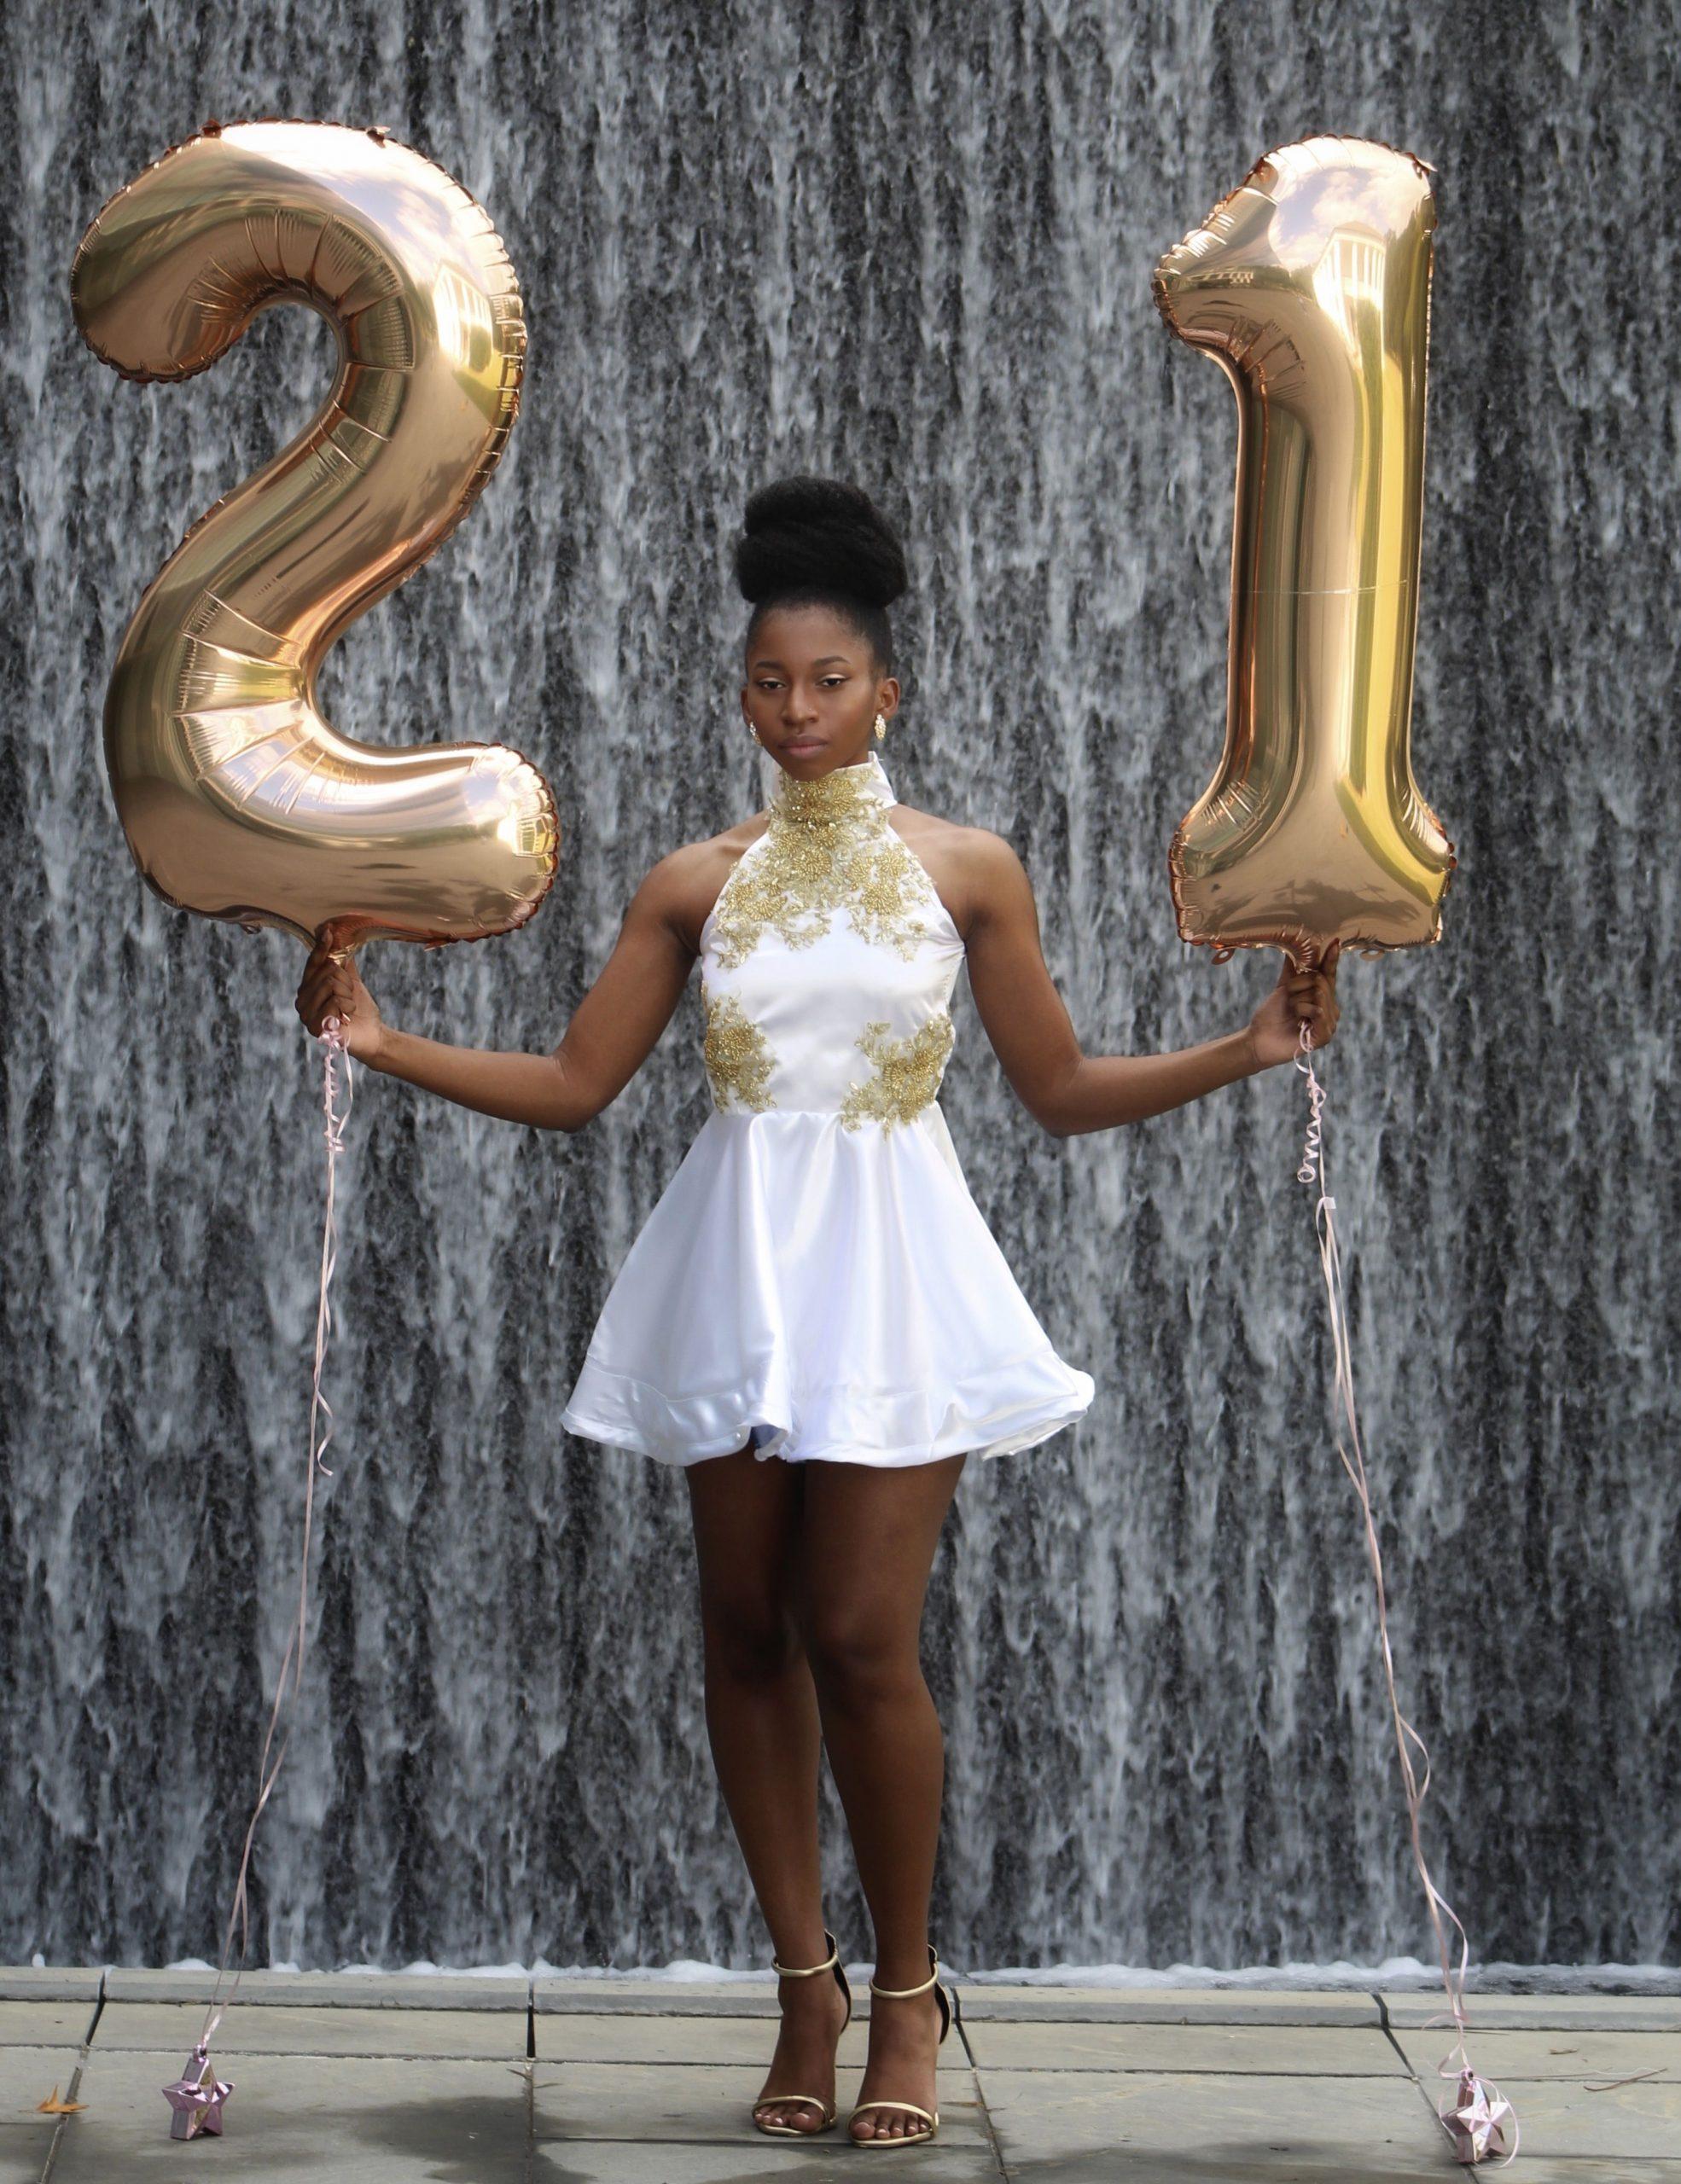 Park Art|My WordPress Blog_21st Birthday Photoshoot Outfit Ideas